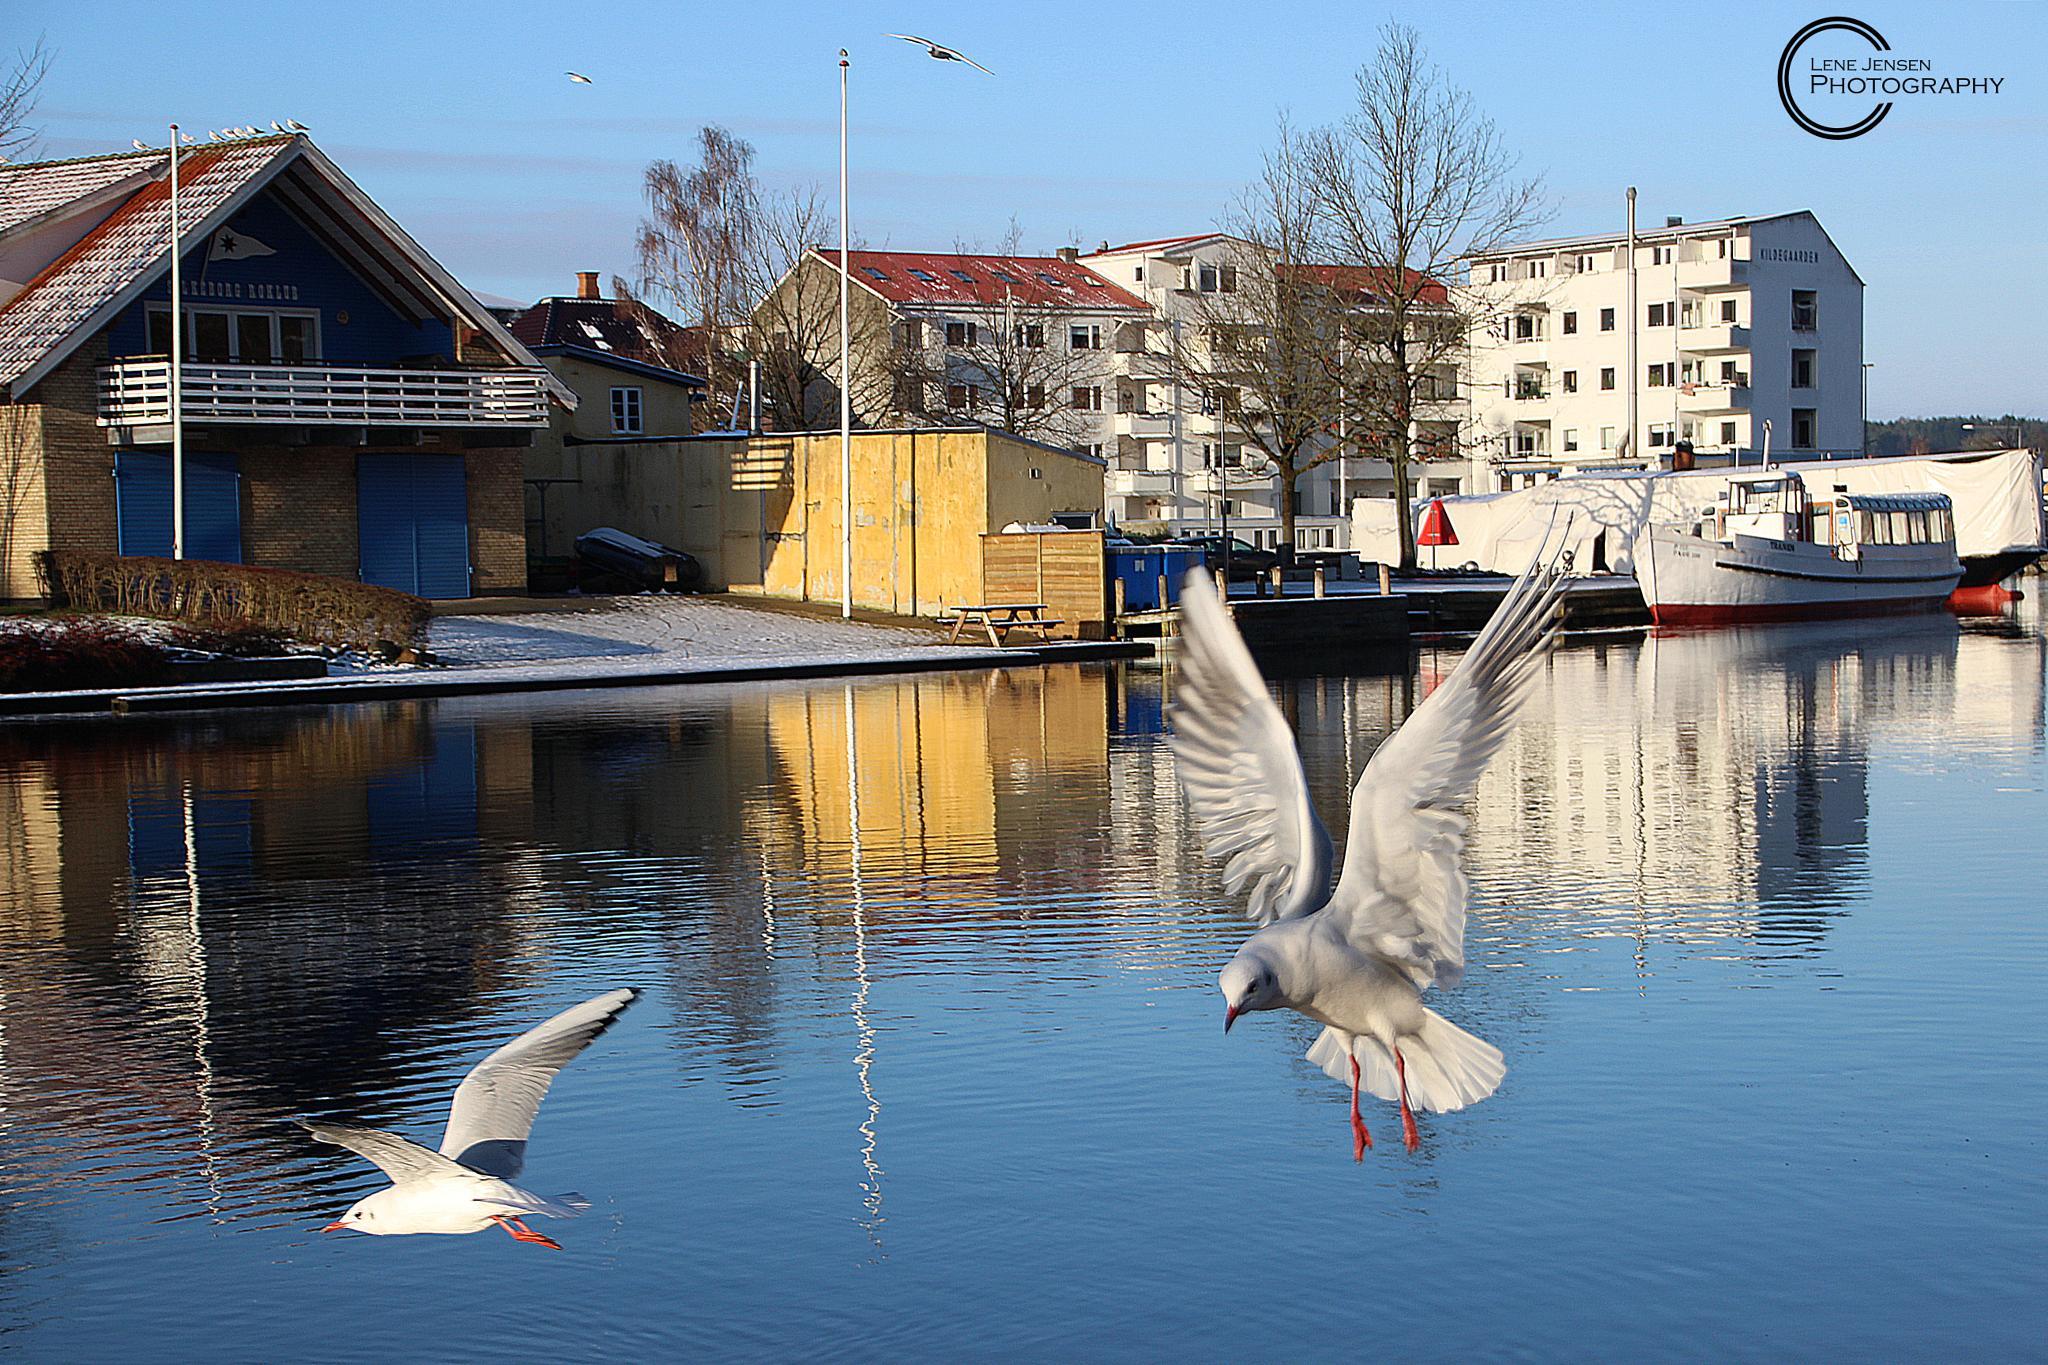 Seagulls by lenejohansen969